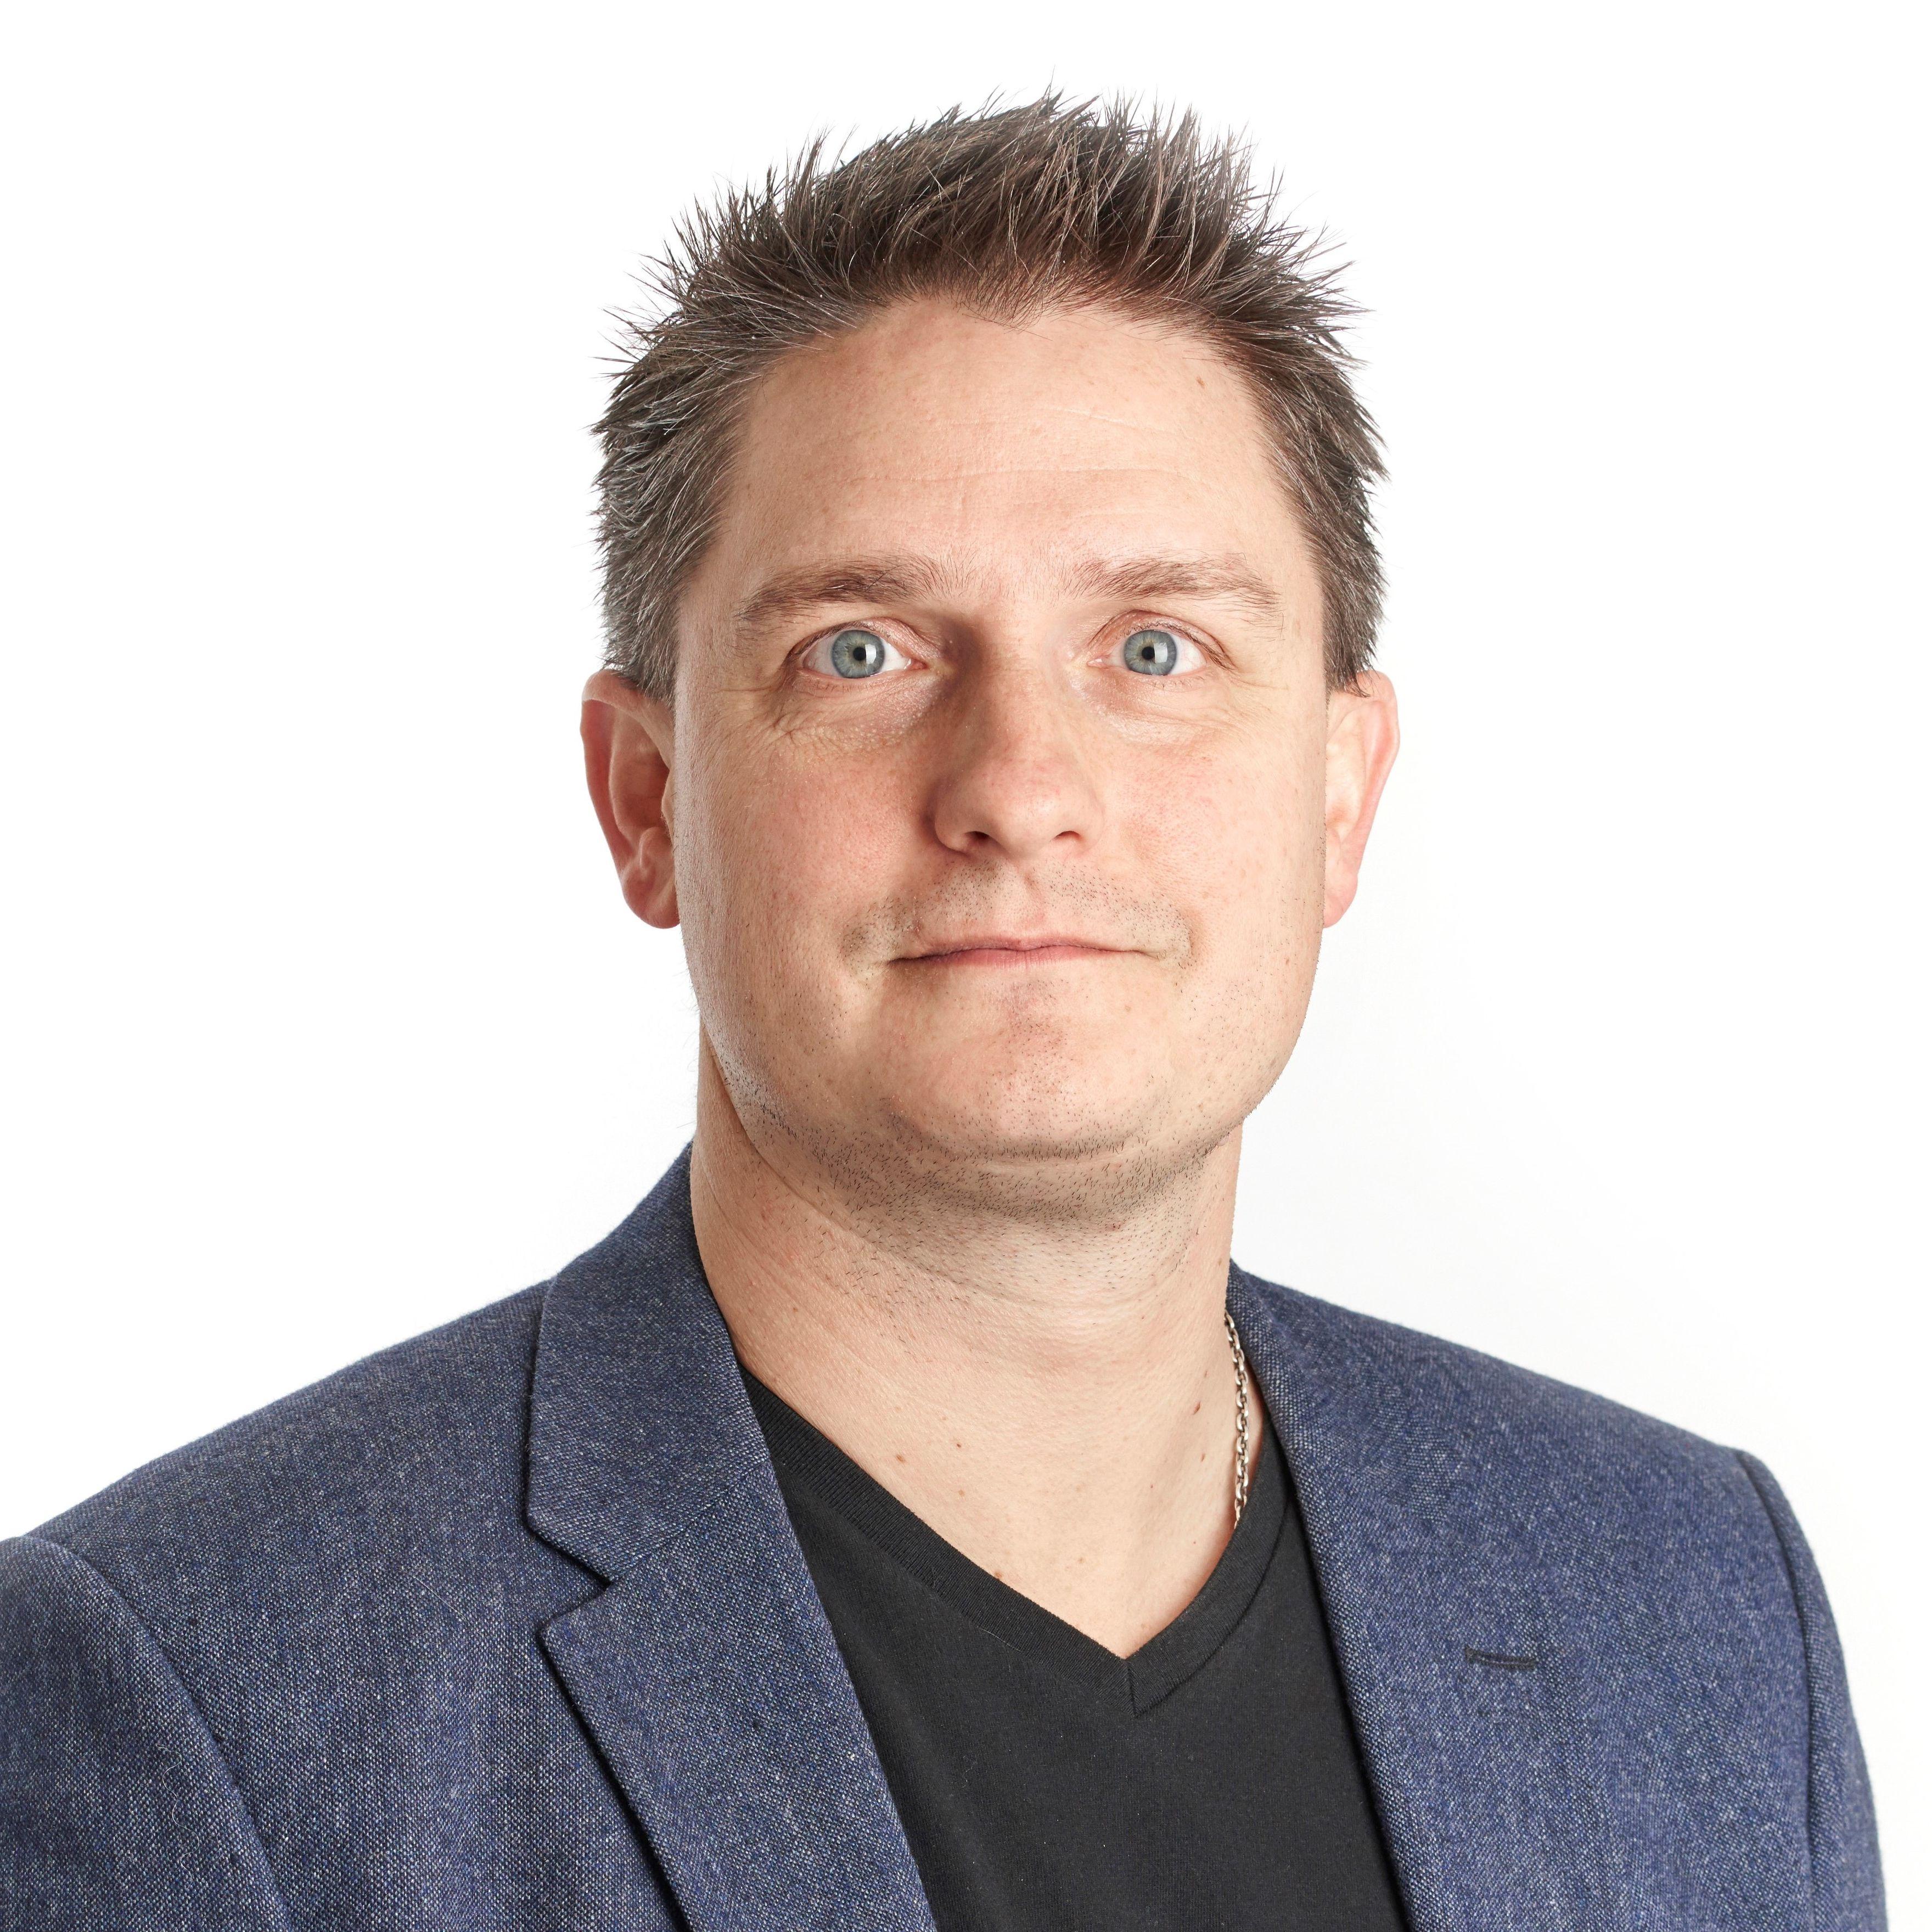 Profile photo of Rob Hattrell, Non-Executive Director at Future